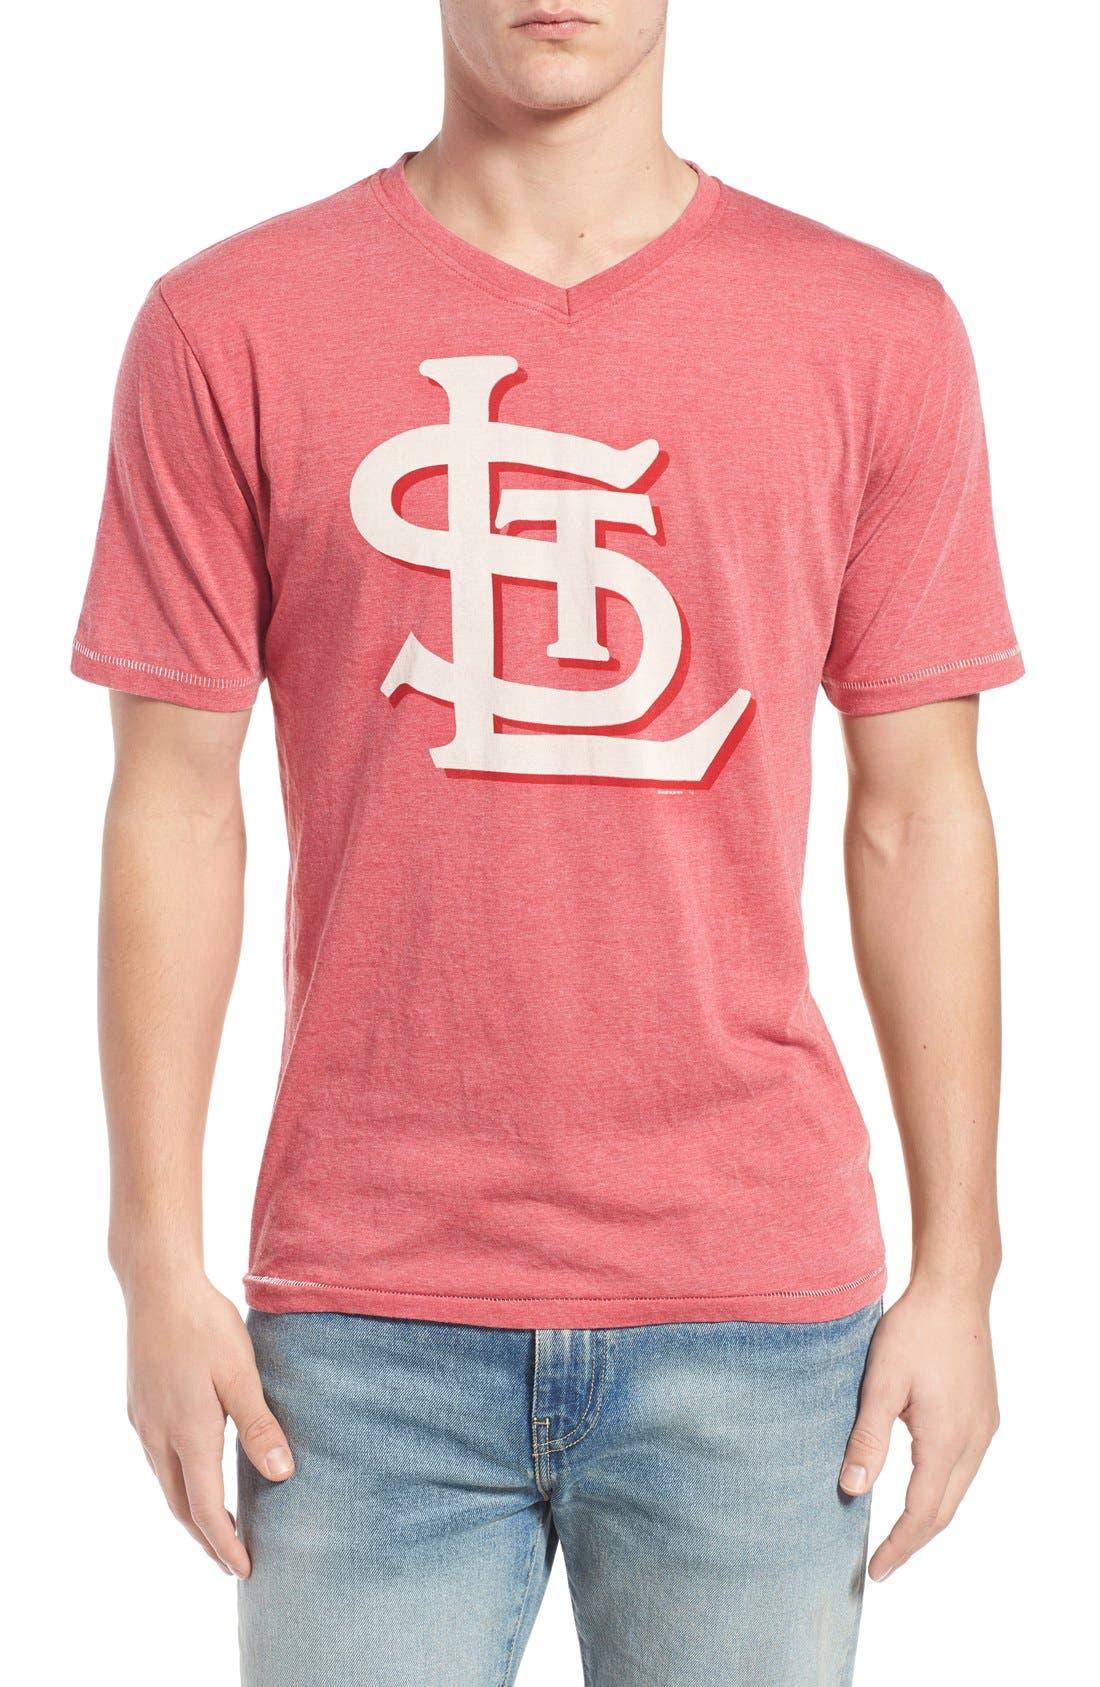 Main Image - Red Jacket 'Saint Louis Cardinals - Calumet' Graphic V-Neck T-Shirt